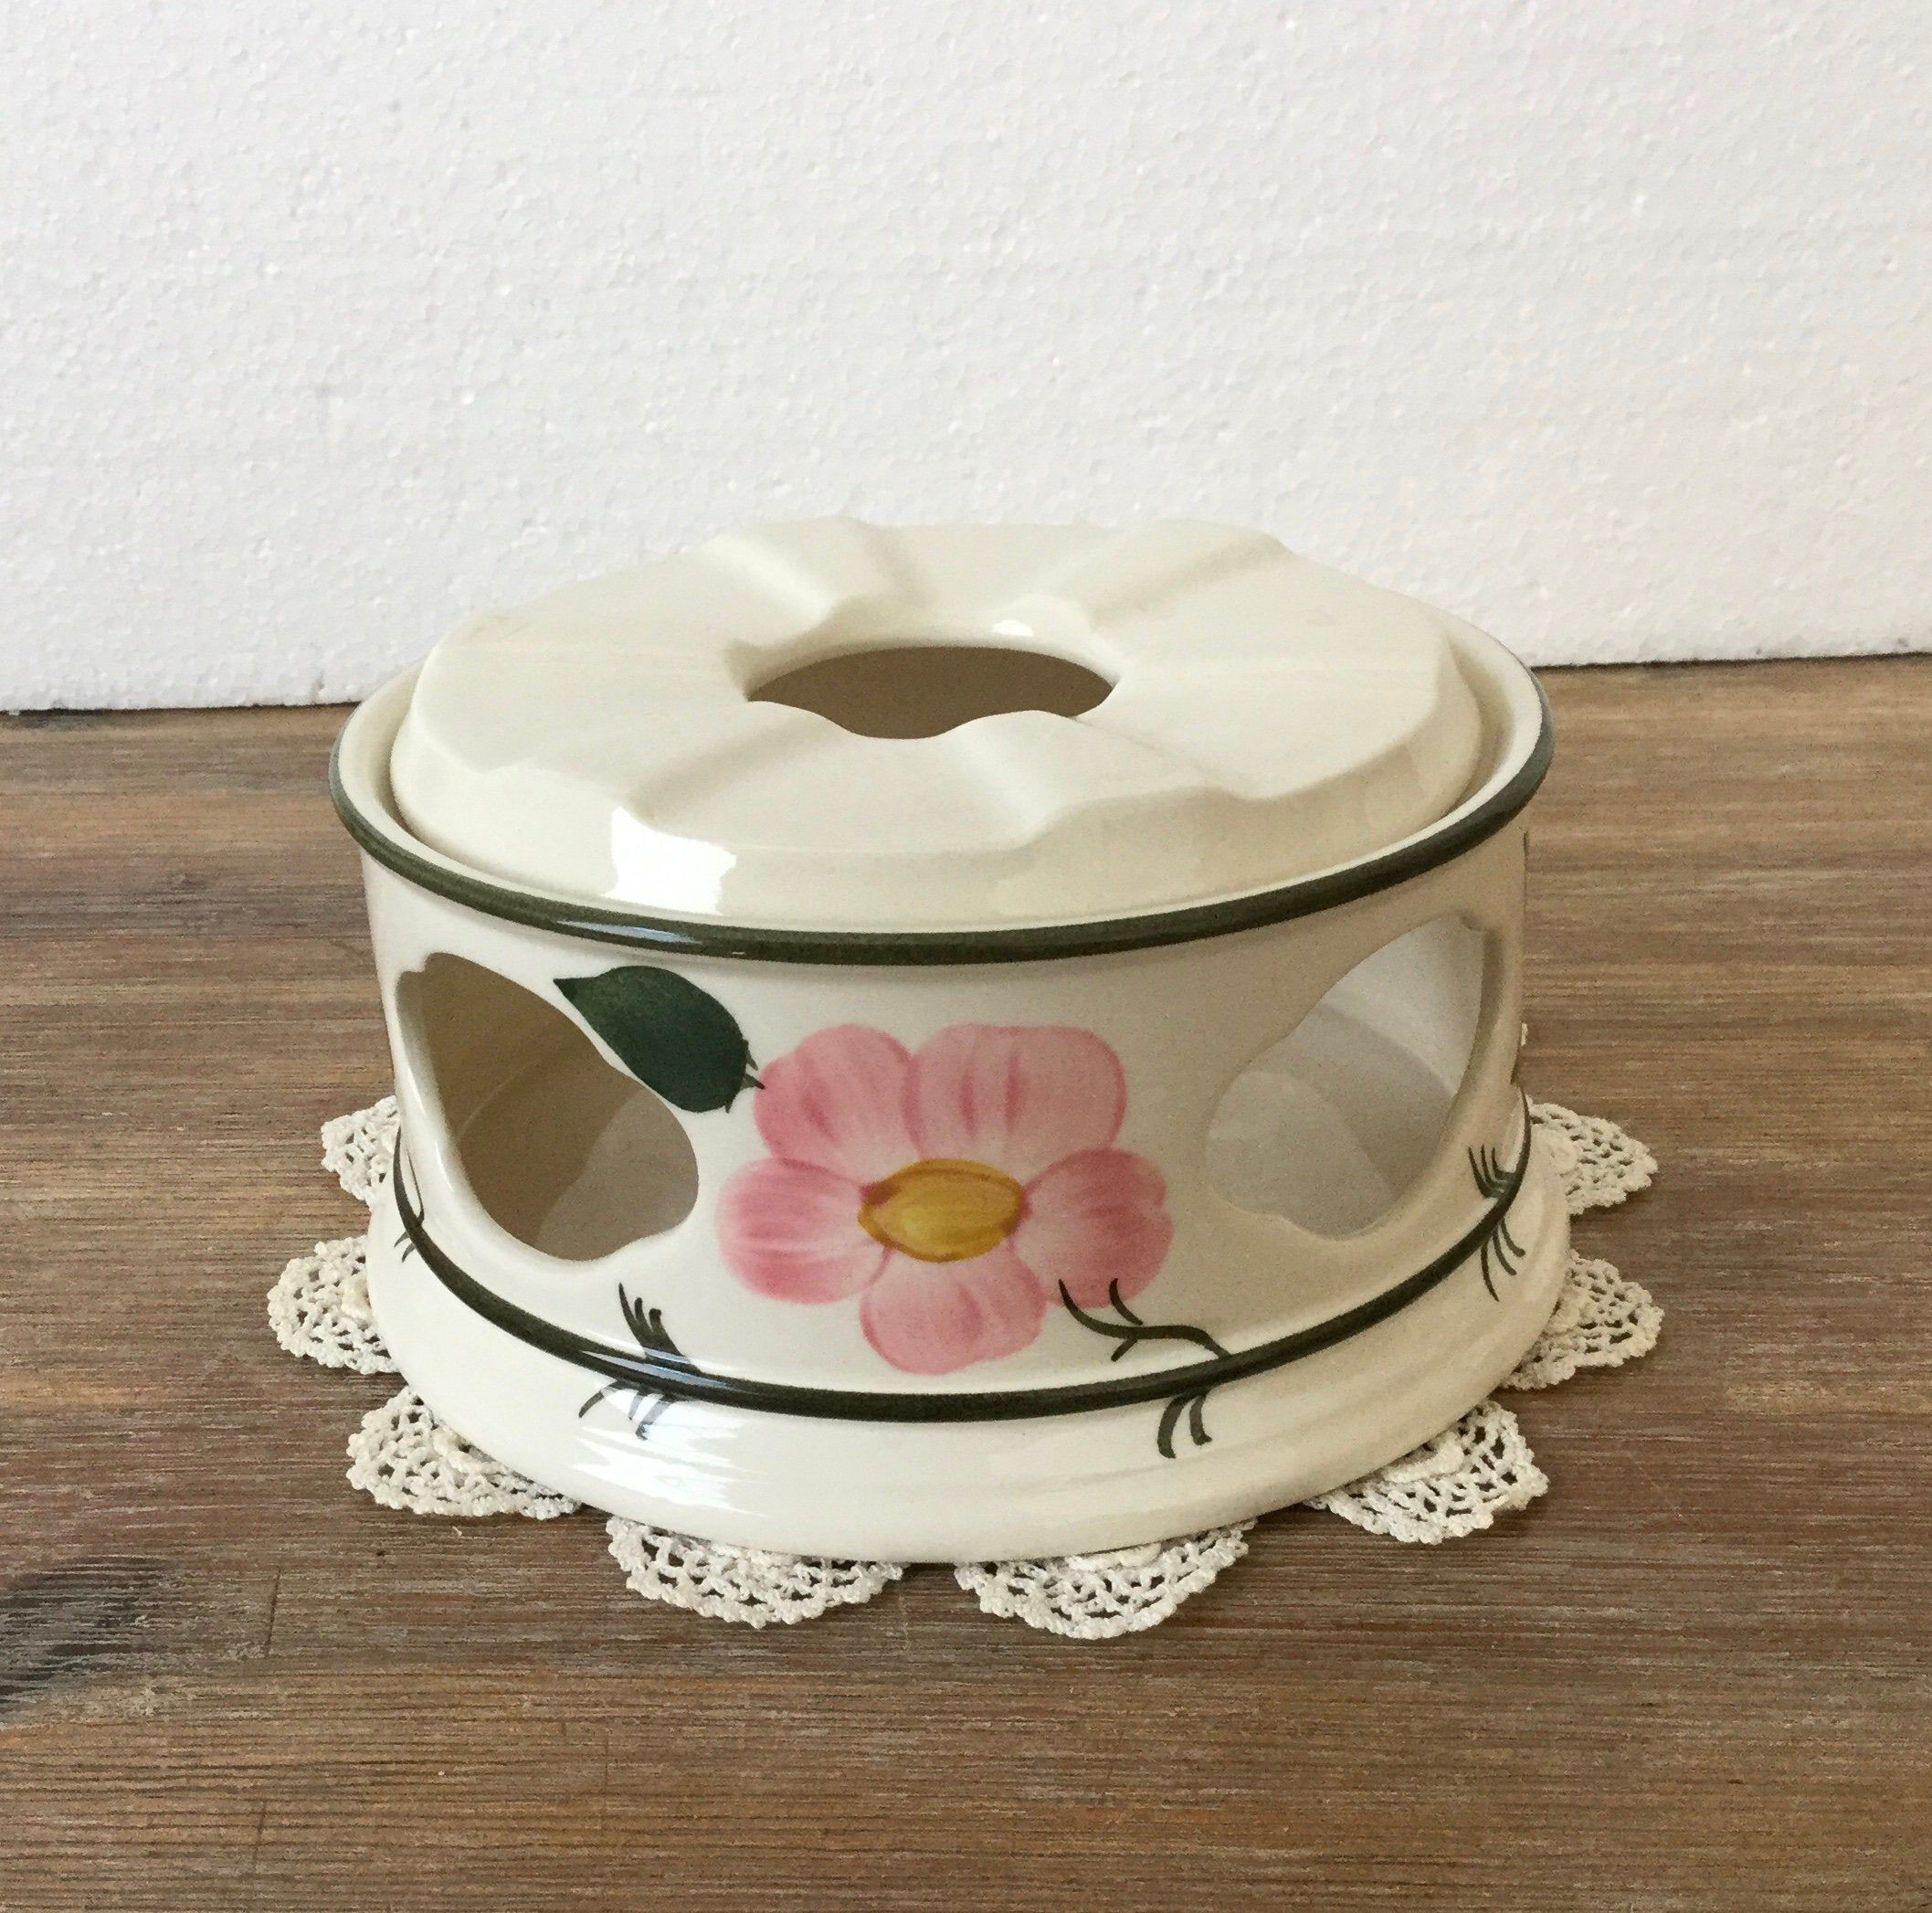 Villeroy Boch Wild Rose Pot Warmer Rechaud Wildrose Pattern In 2020 Villeroy Boch Vintage Tea Party Vintage Tea